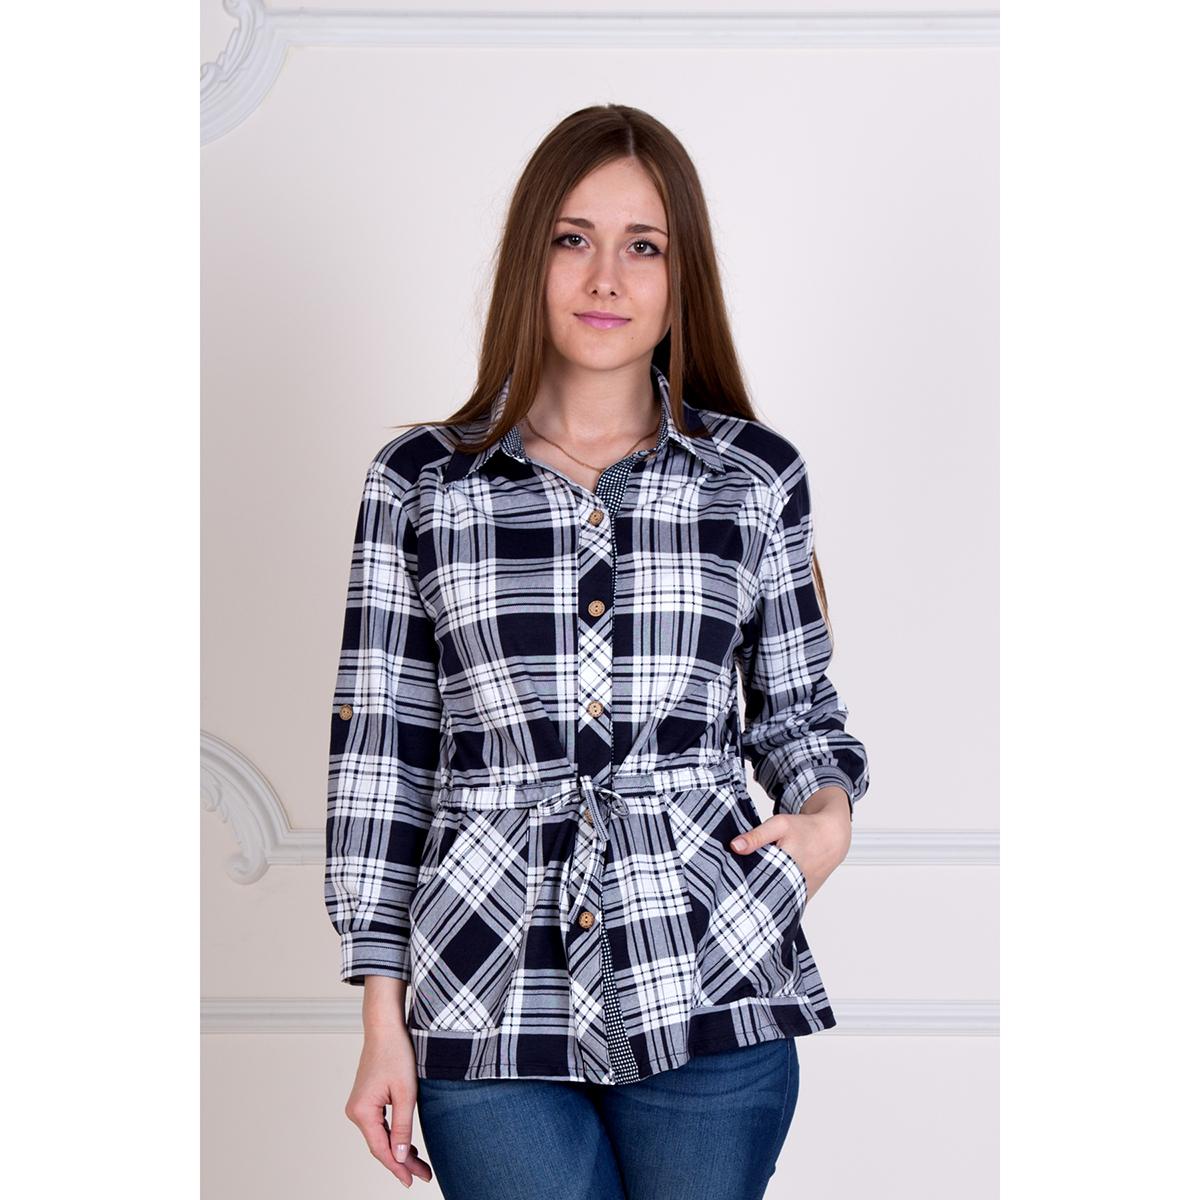 Женская рубашка Клетка Черный, размер 60Рубашки<br>Обхват груди:120 см<br>Обхват талии:101 см<br>Обхват бедер:128 см<br>Рост:167 см<br><br>Тип: Жен. рубашка<br>Размер: 60<br>Материал: Кулирка